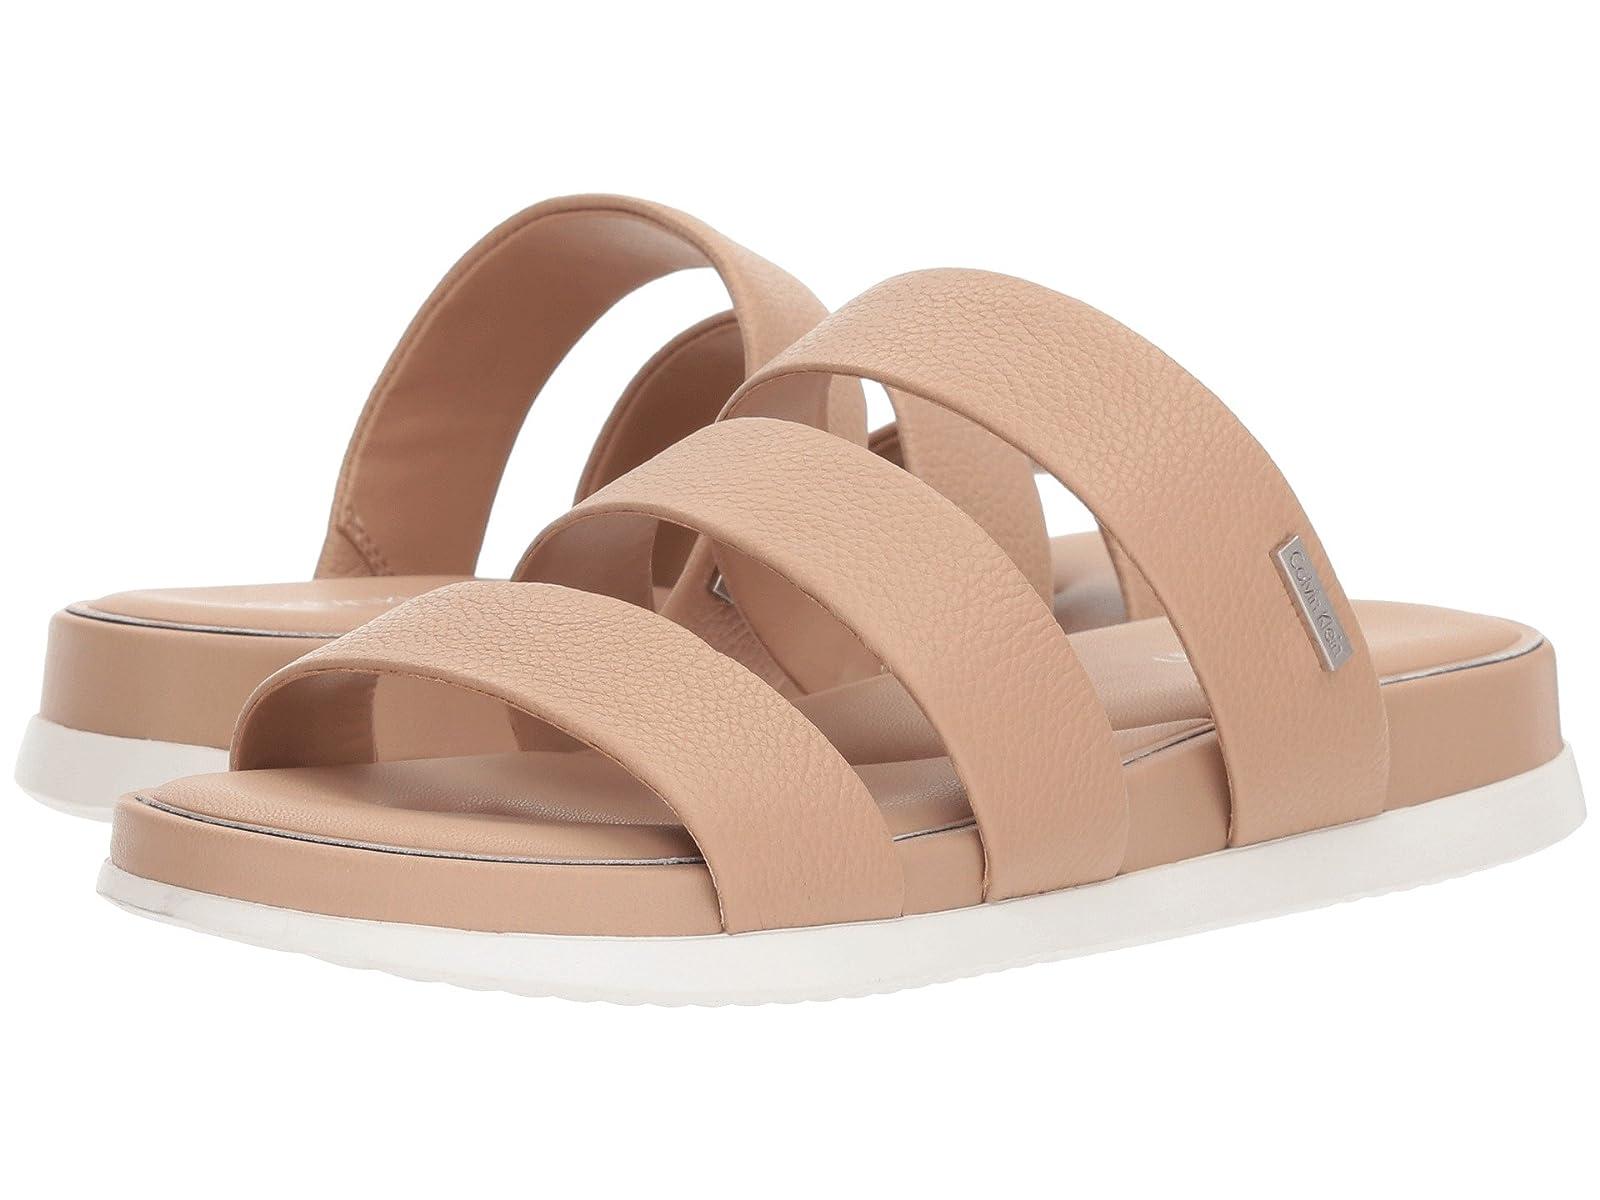 Calvin Klein Dalana Slide Sandal Sandal Sandal 2c6a8c